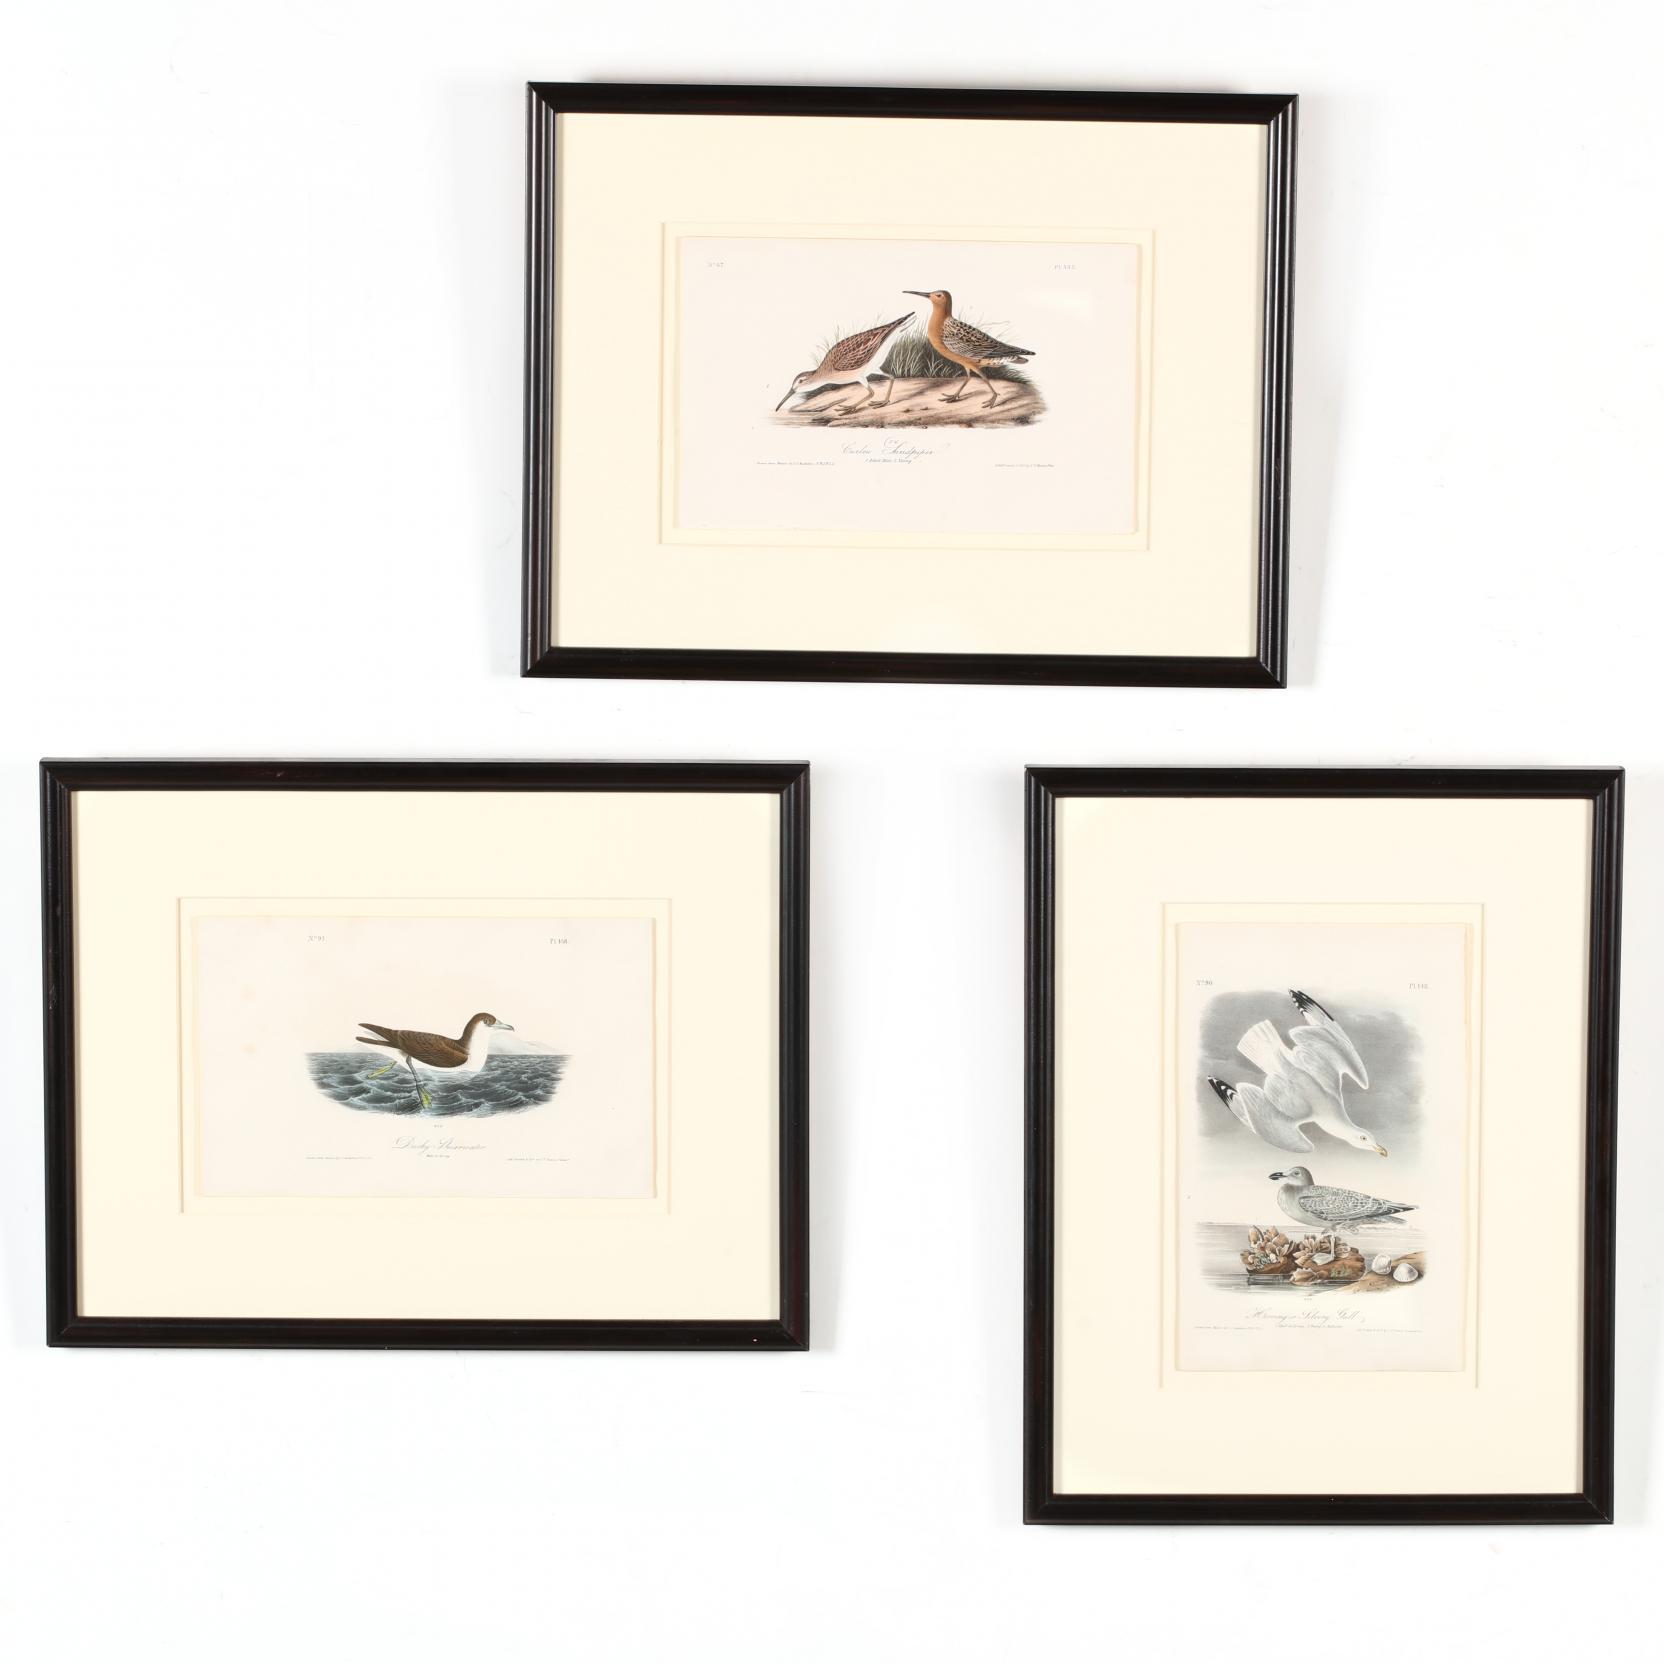 after-john-james-audubon-american-1785-1851-three-framed-prints-from-i-birds-of-america-i